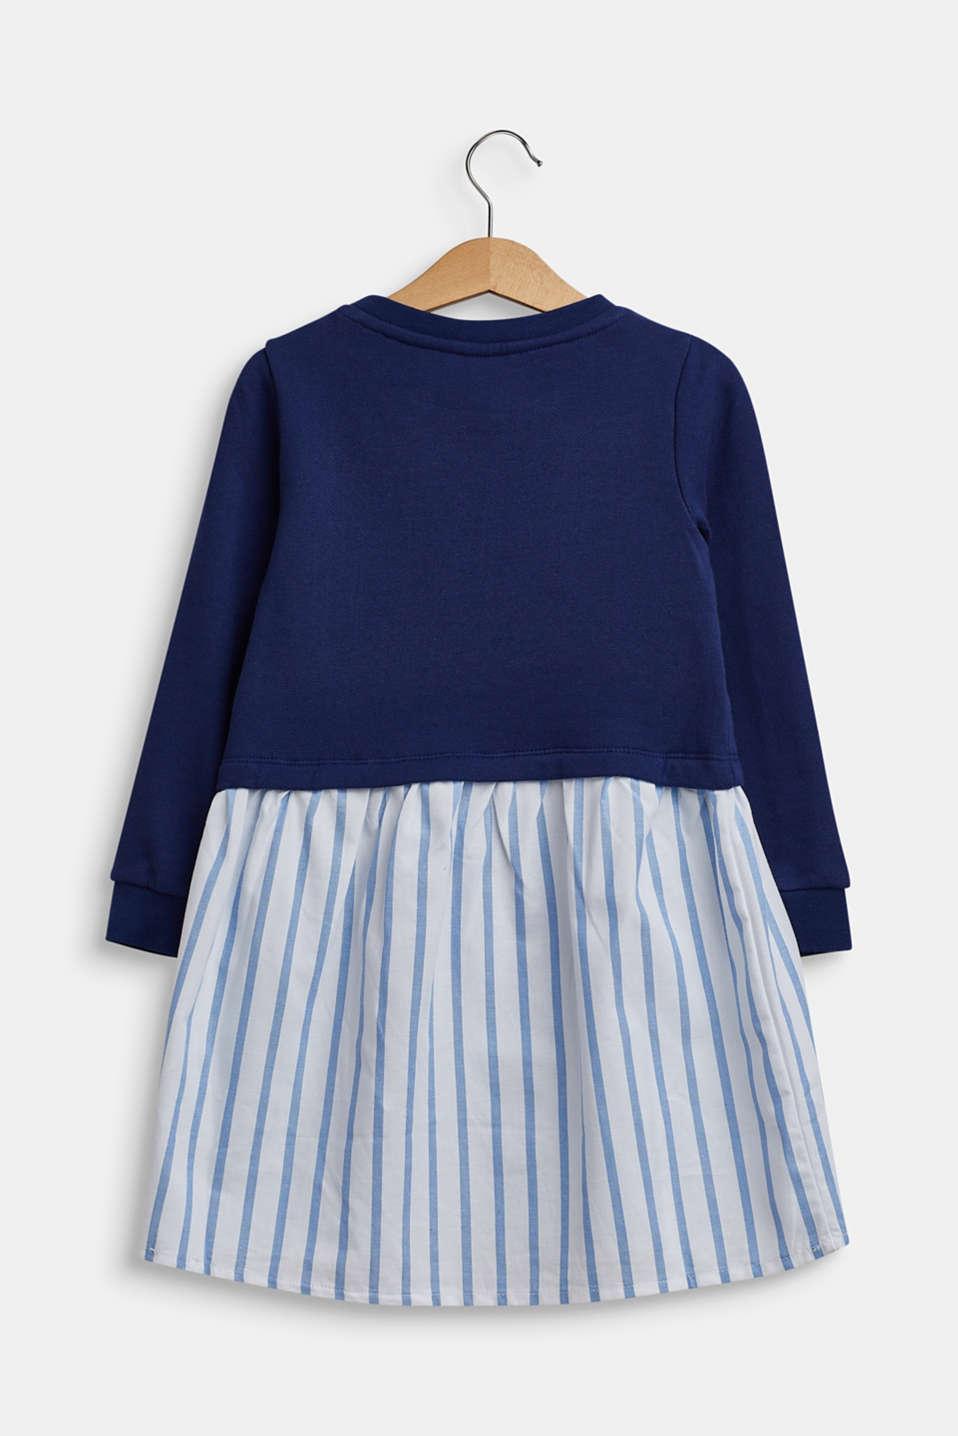 Dresses knitted, LCMARINE BLUE, detail image number 1